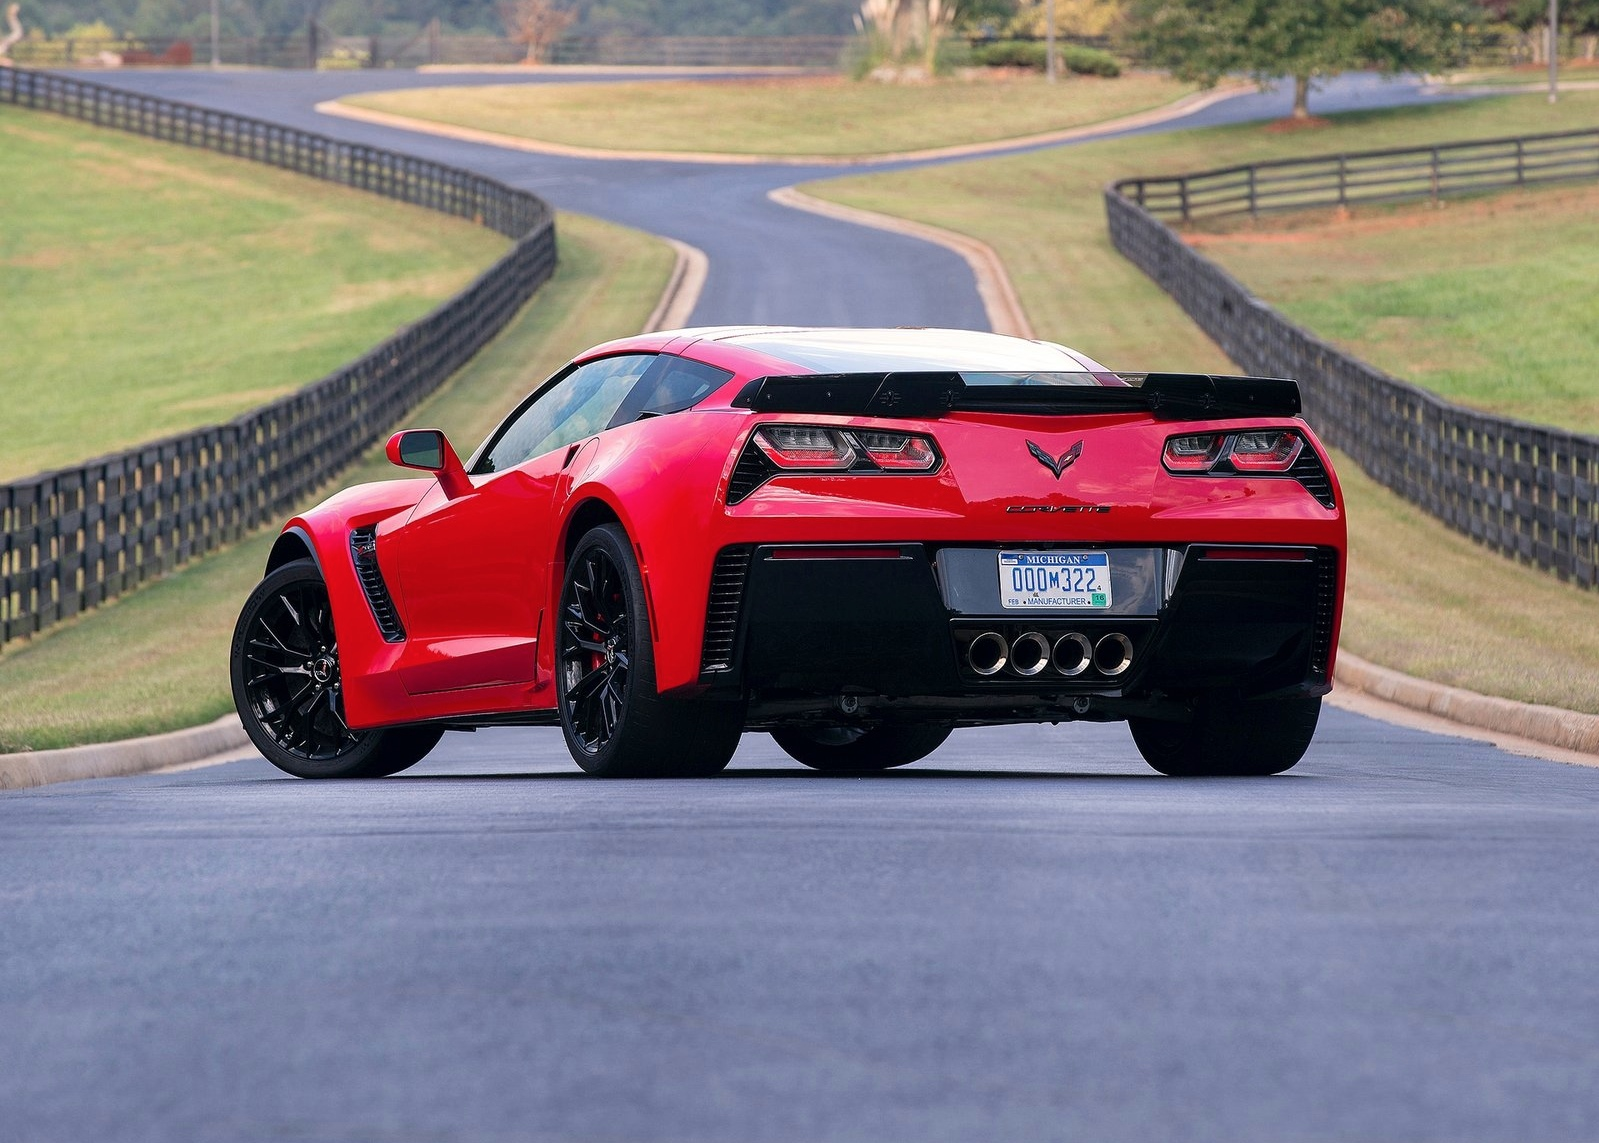 2015 Corvette Z06 Owners Report Heat Soak Power Loss: Actually a